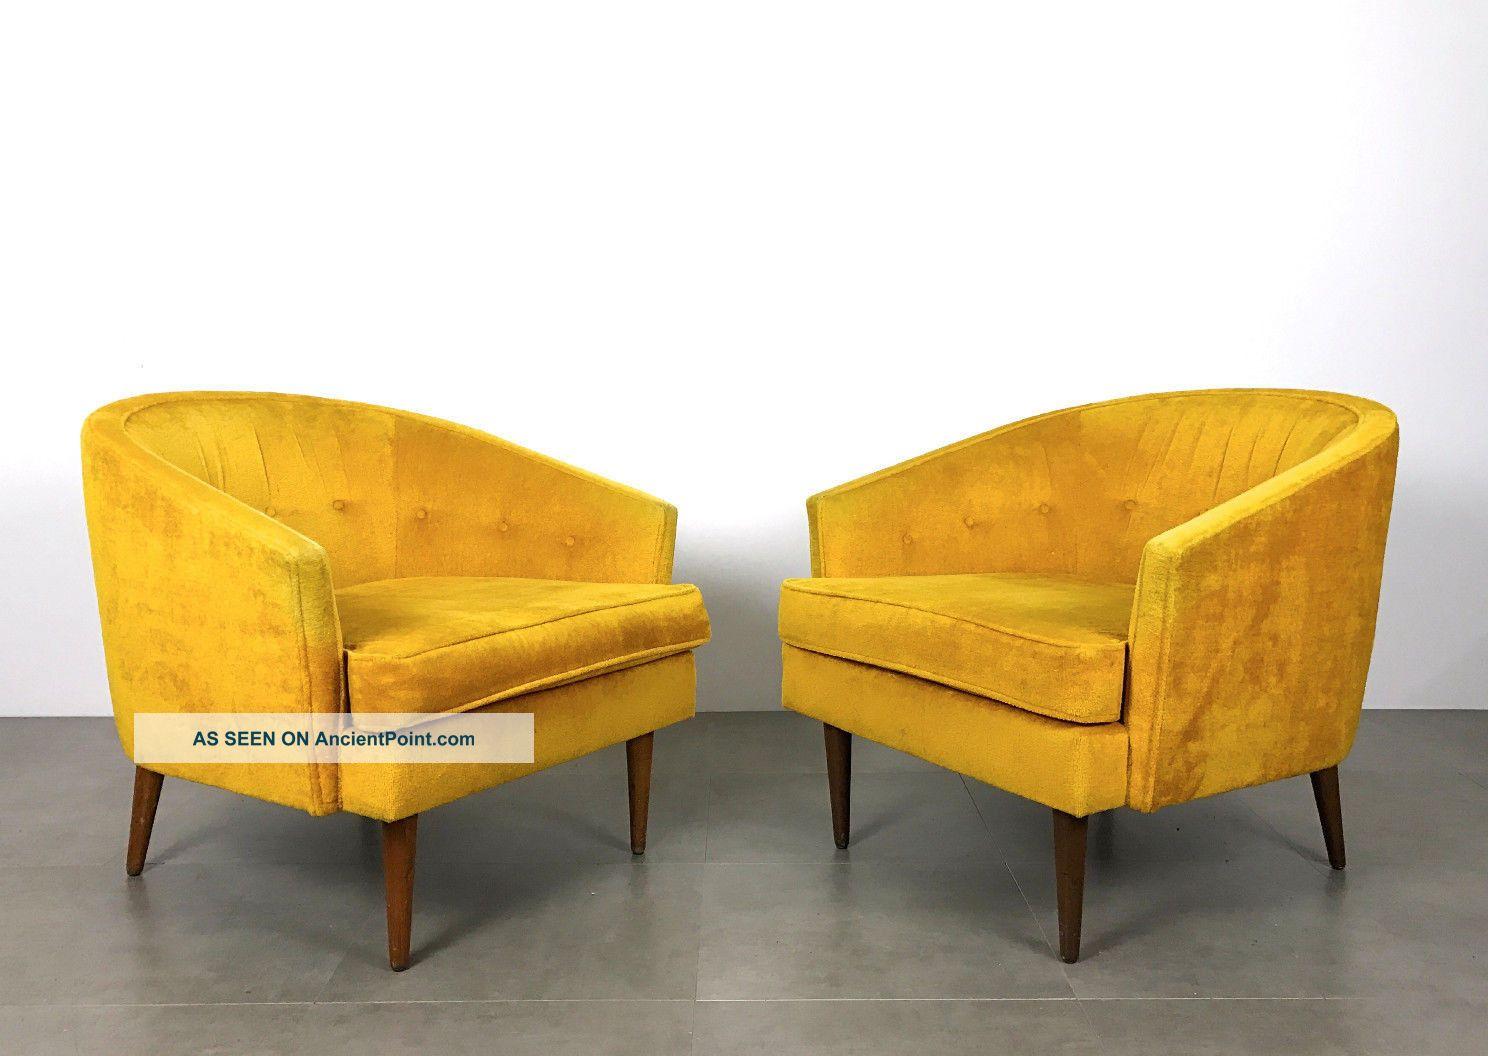 Pair Vintage Mid Century Modern Barrel Back Lounge Chairs Peabody,  Baughman Era Post-1950 photo